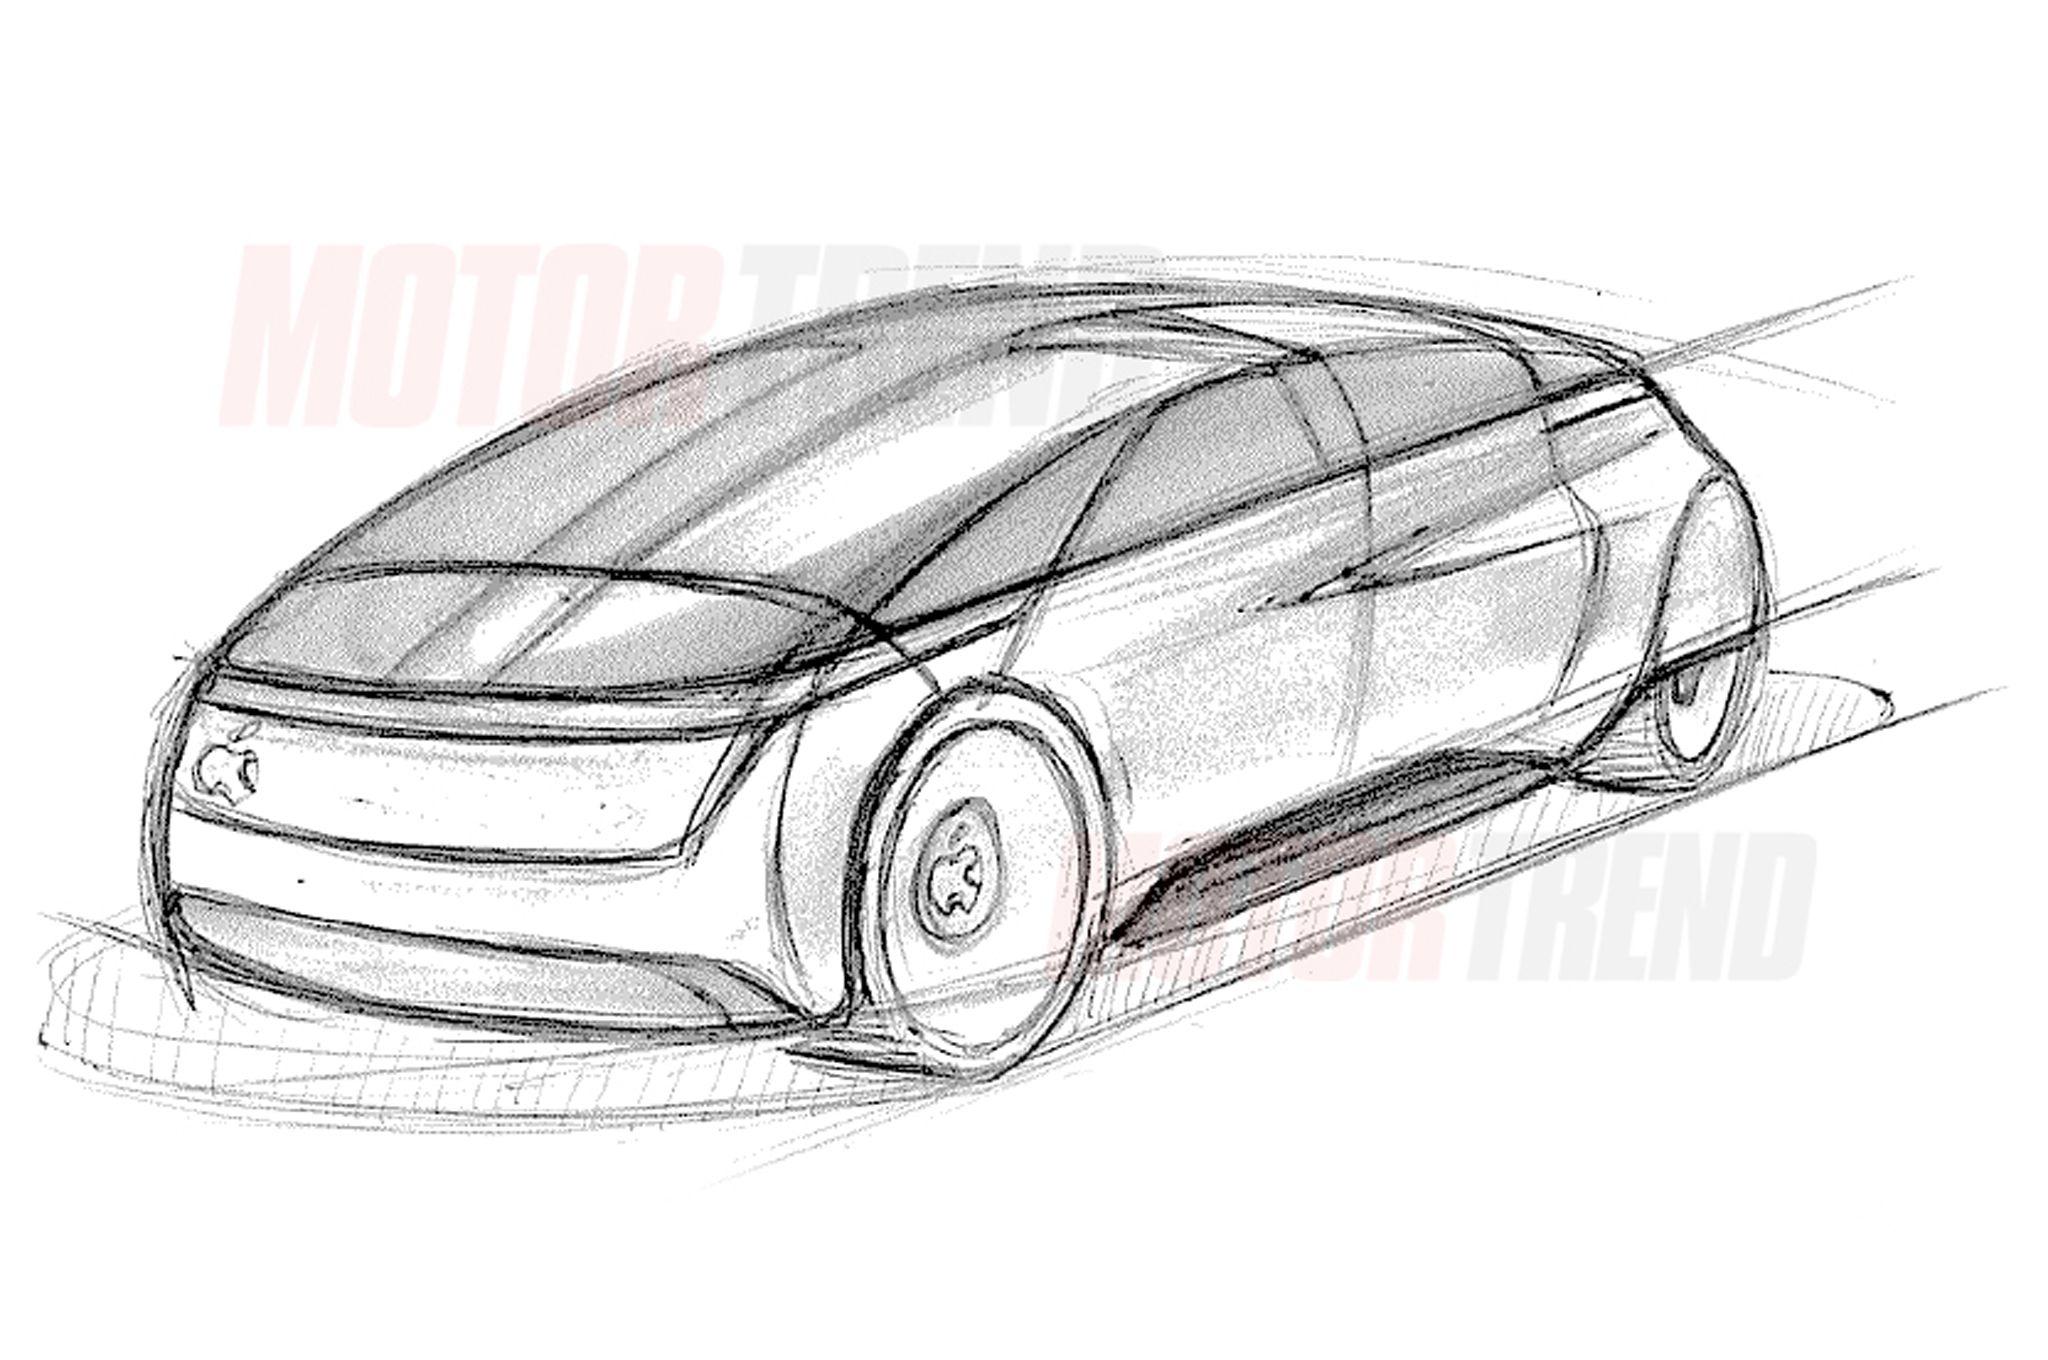 Pin by Matthew Malek on Car Design!   Pinterest   Cars